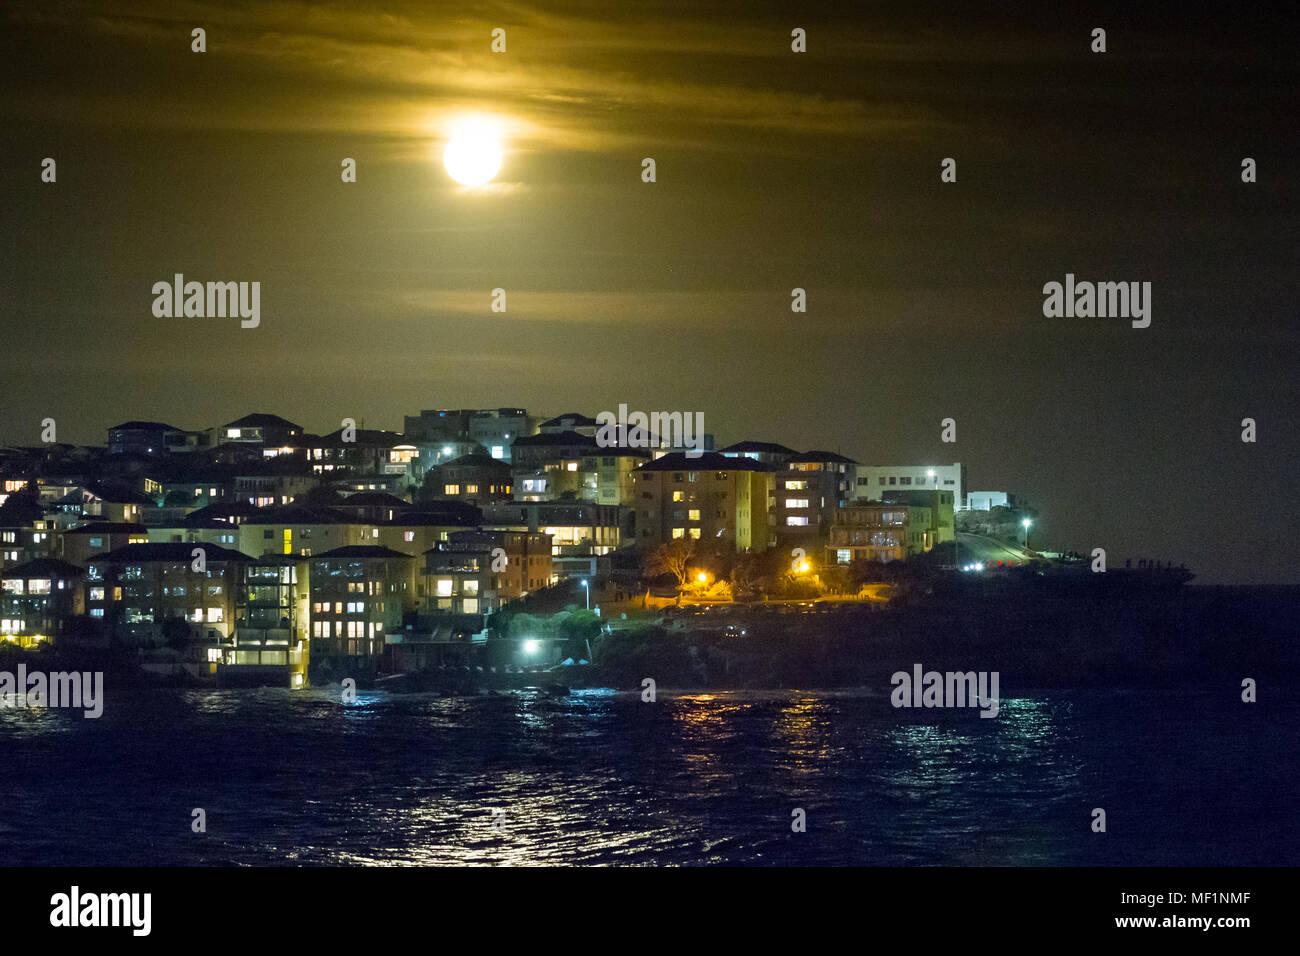 Next full moon date in Sydney